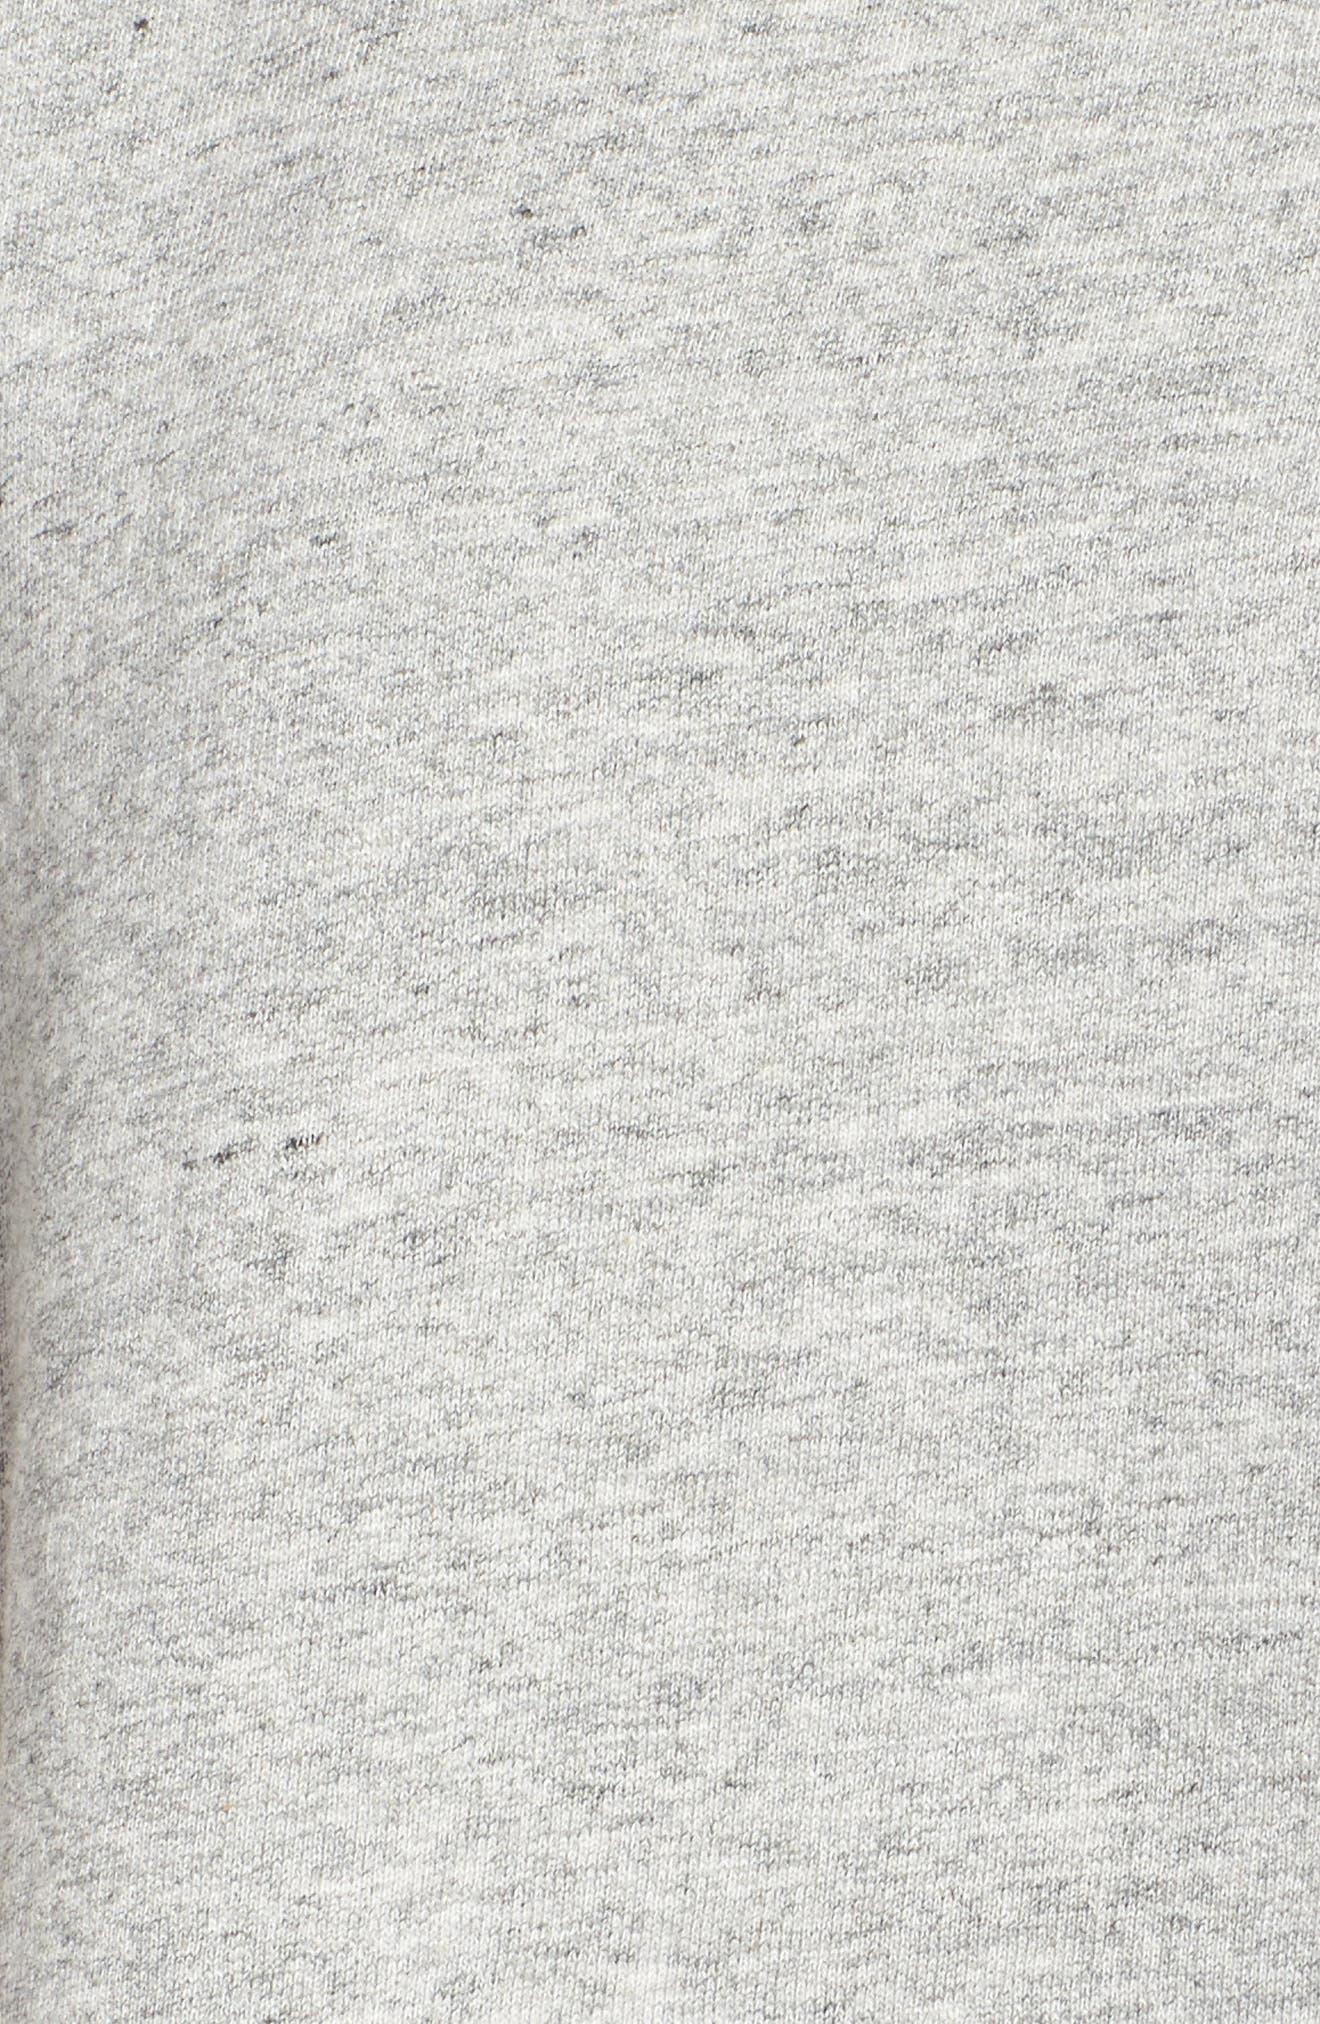 Bes Sweatshirt,                             Alternate thumbnail 5, color,